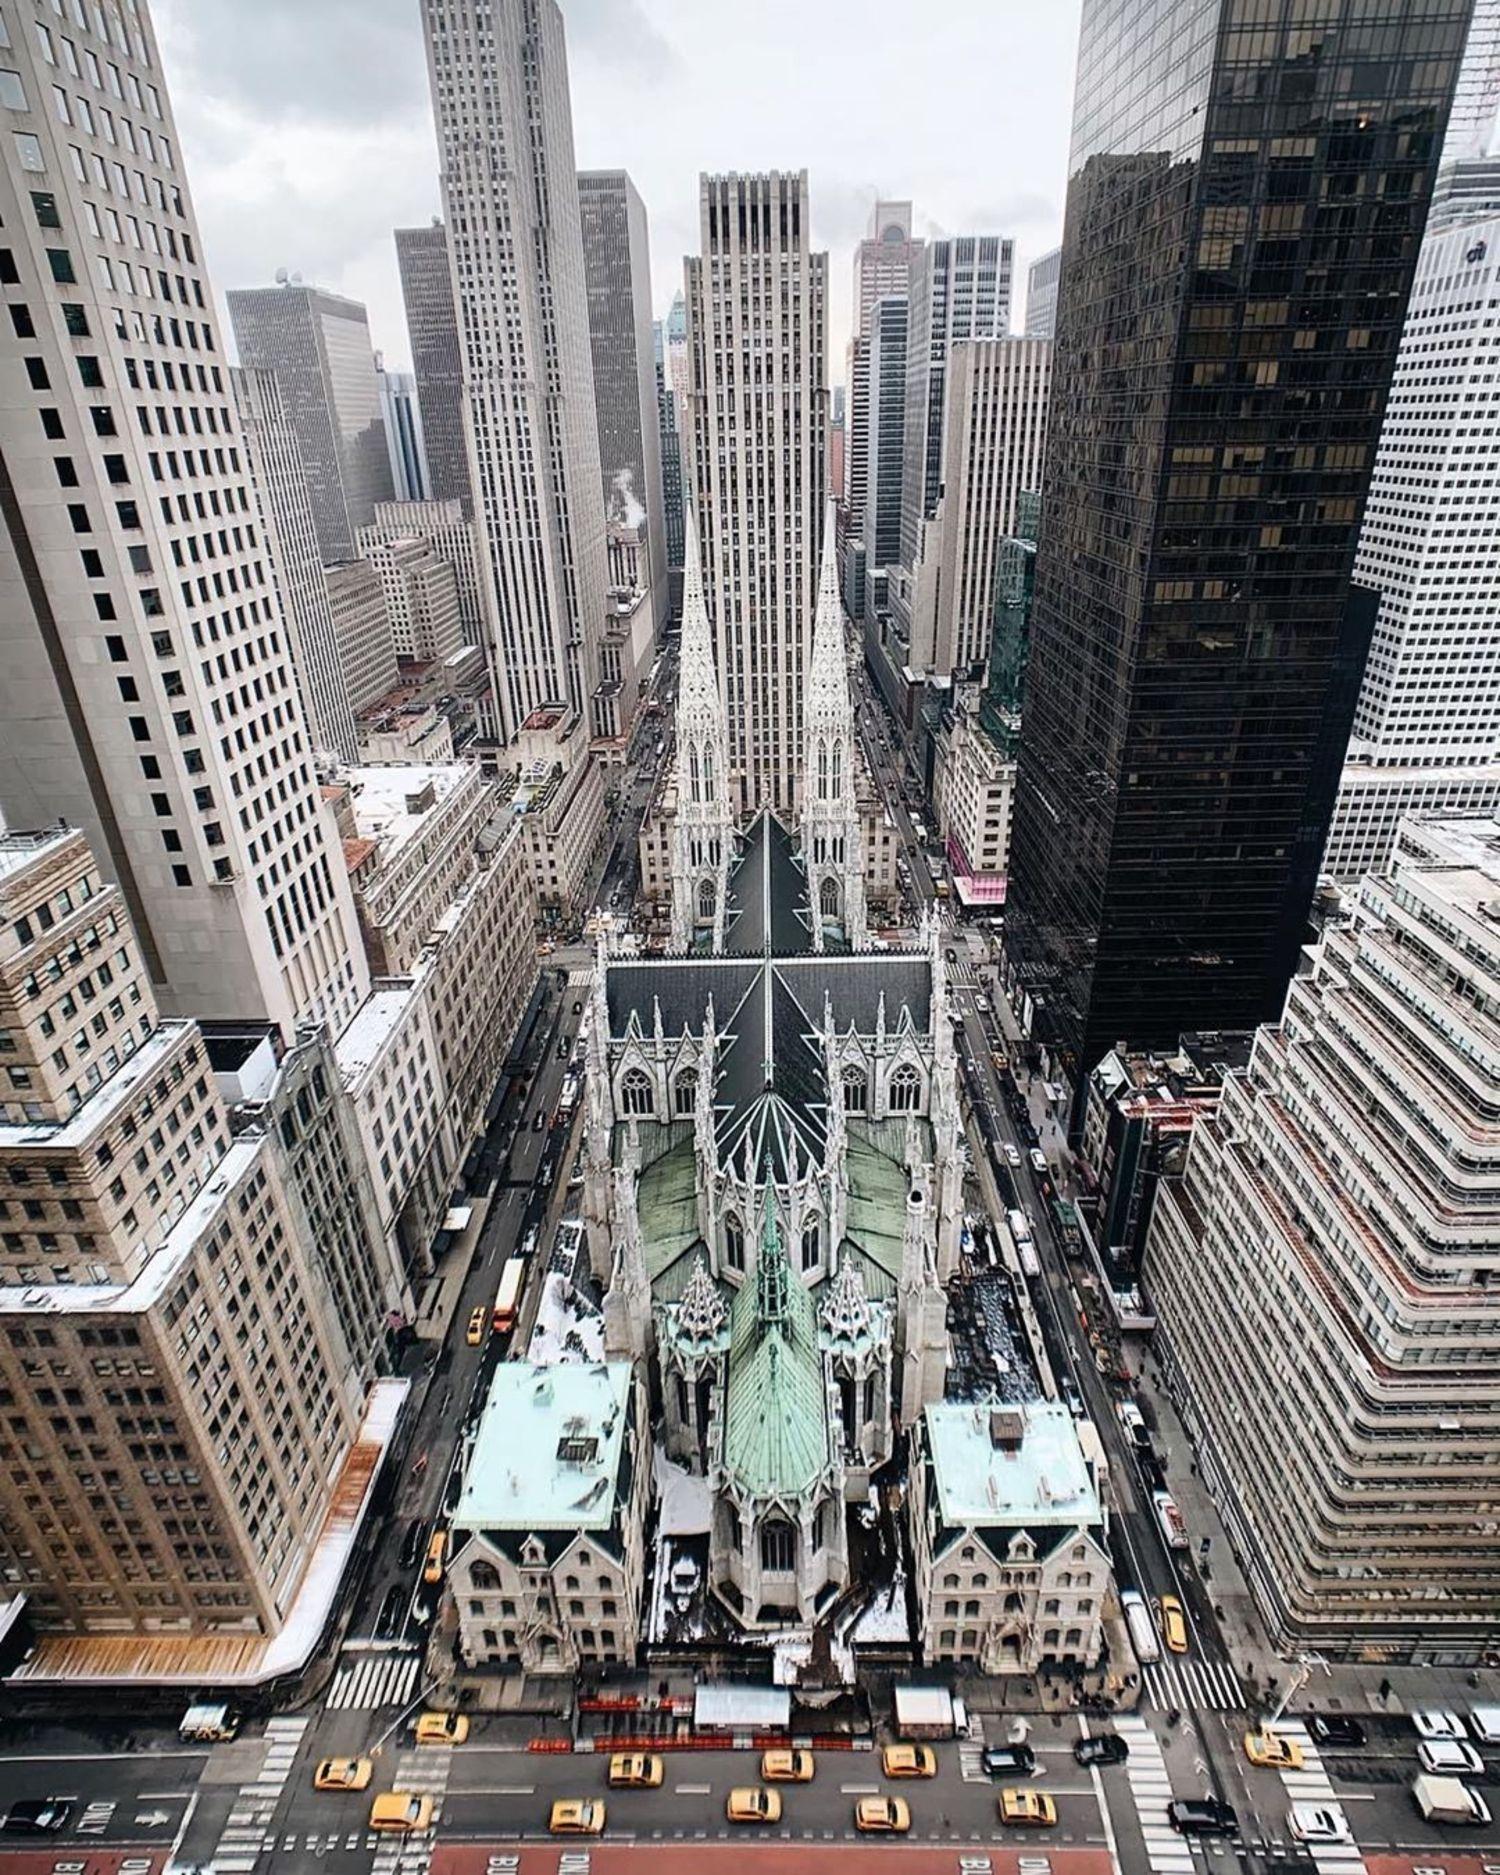 St. Patrick's Cathedral, Midtown, Manhattan.